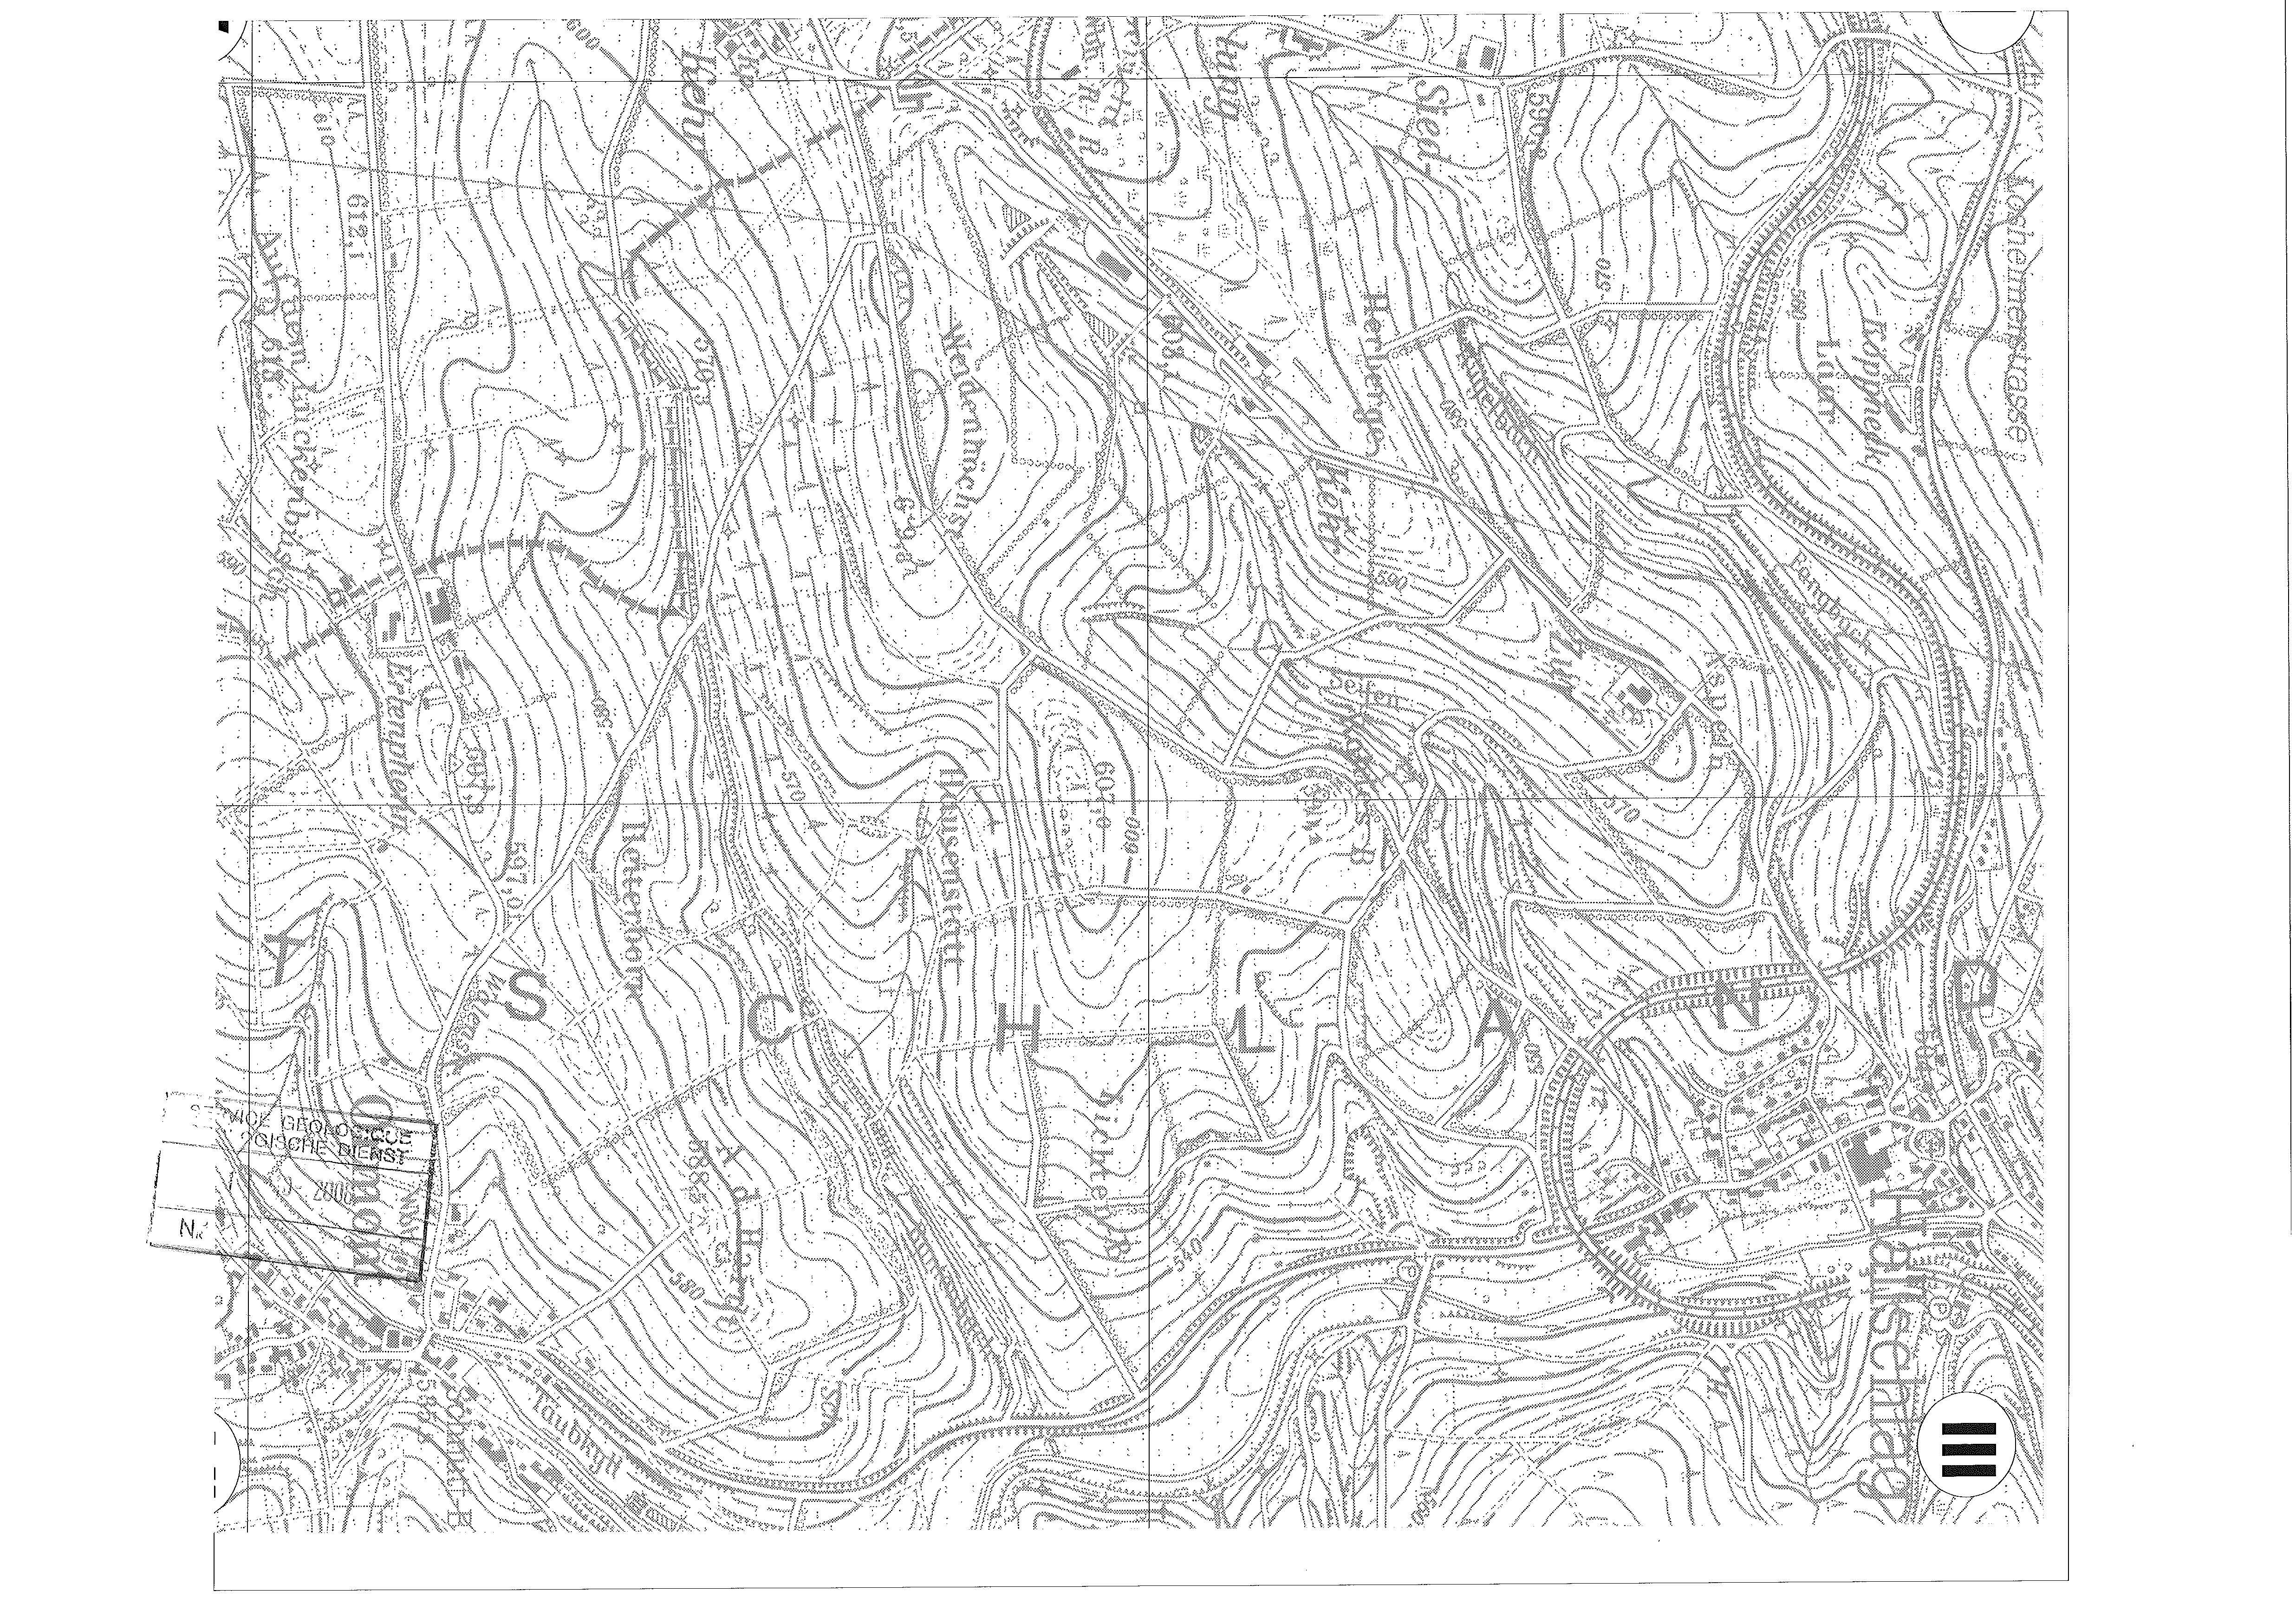 234W_Manderfeld_Page_3_Image_0001.jpg